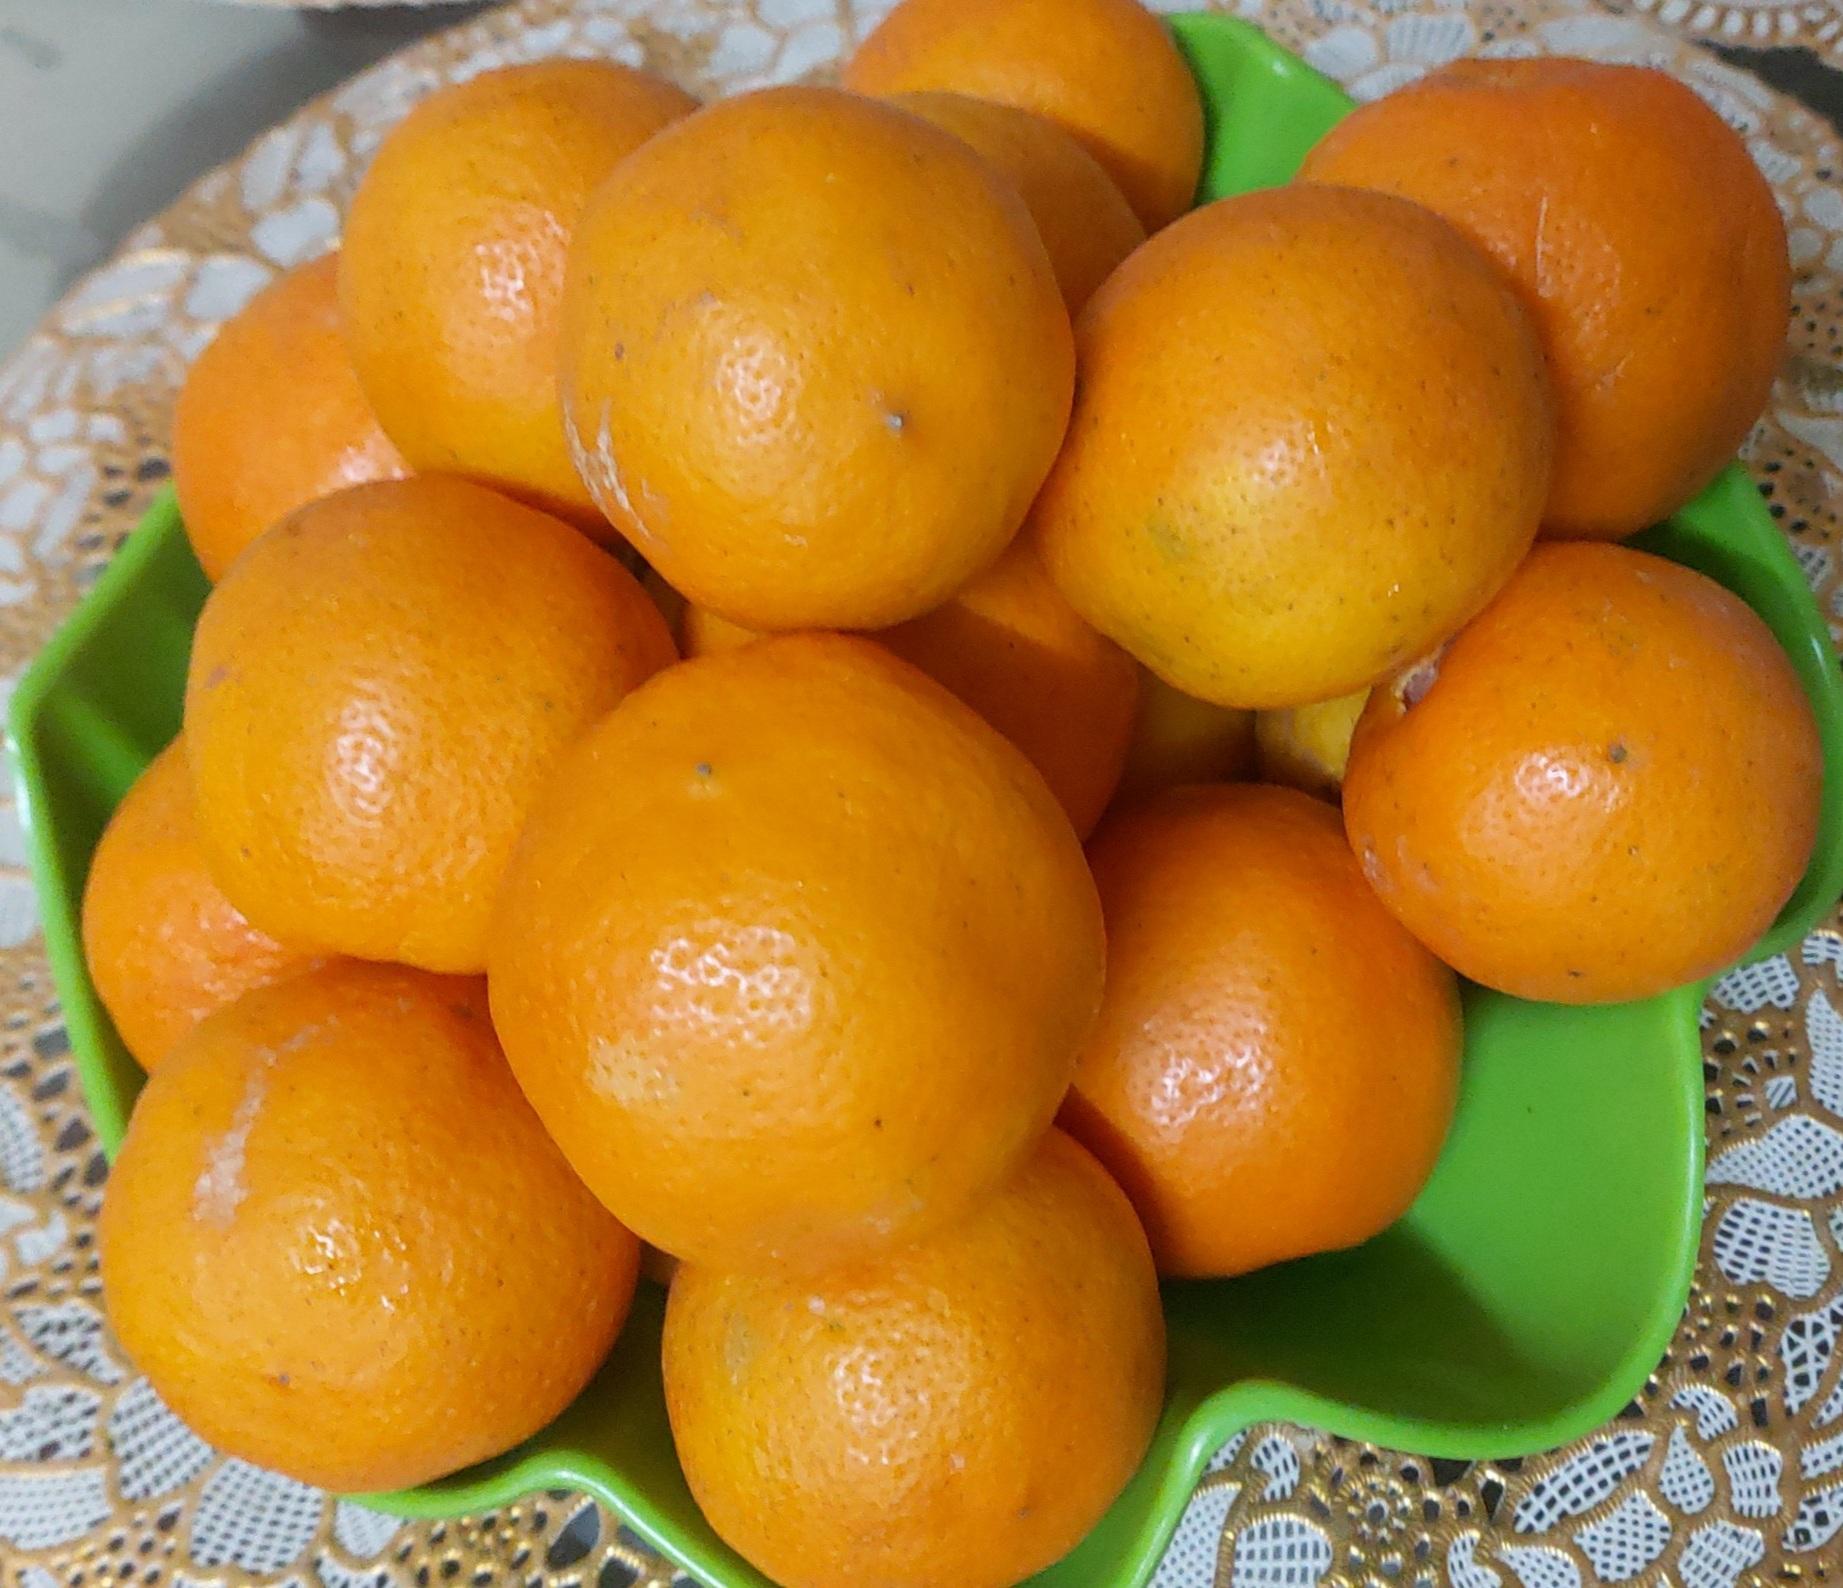 Citrus jambhiri Lush.- Jhamirdi (झमीरडी), jambiri, jambheri,  jatti khatti, khatti.